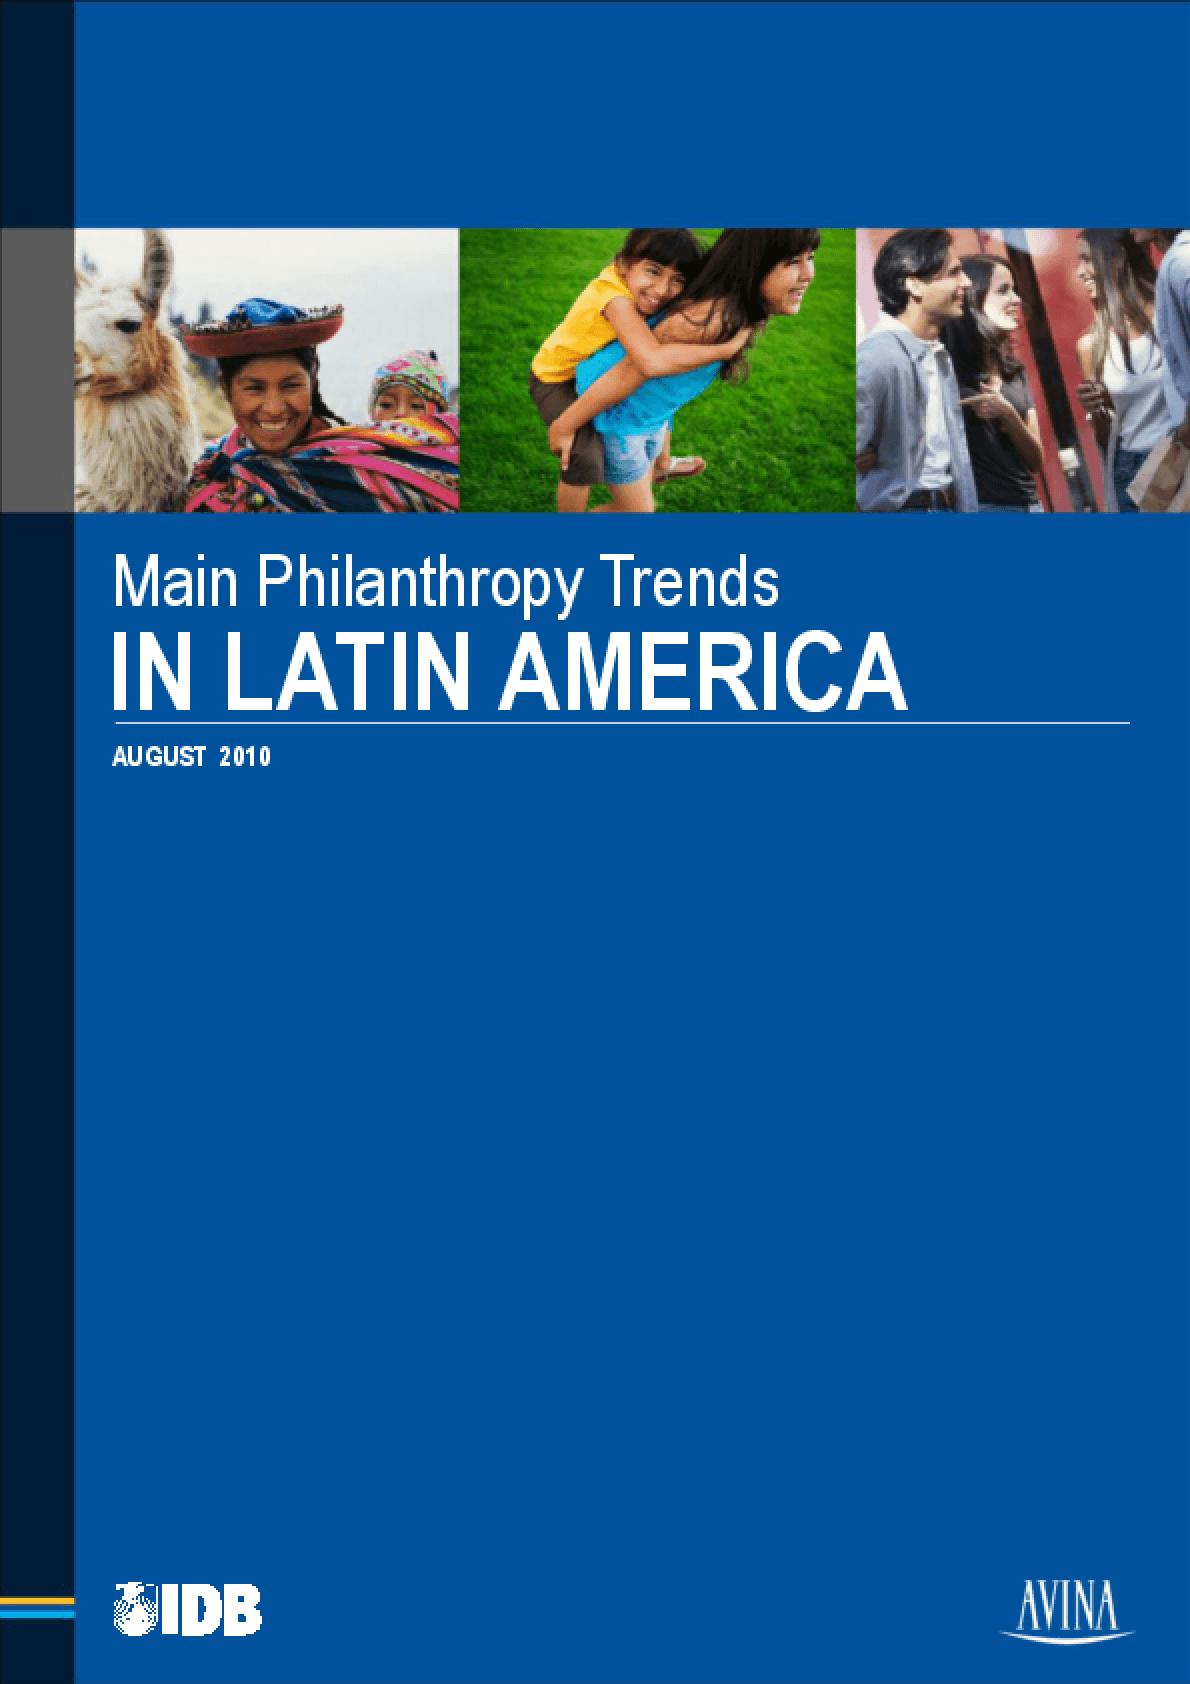 Main Philanthropy Trends in Latin America